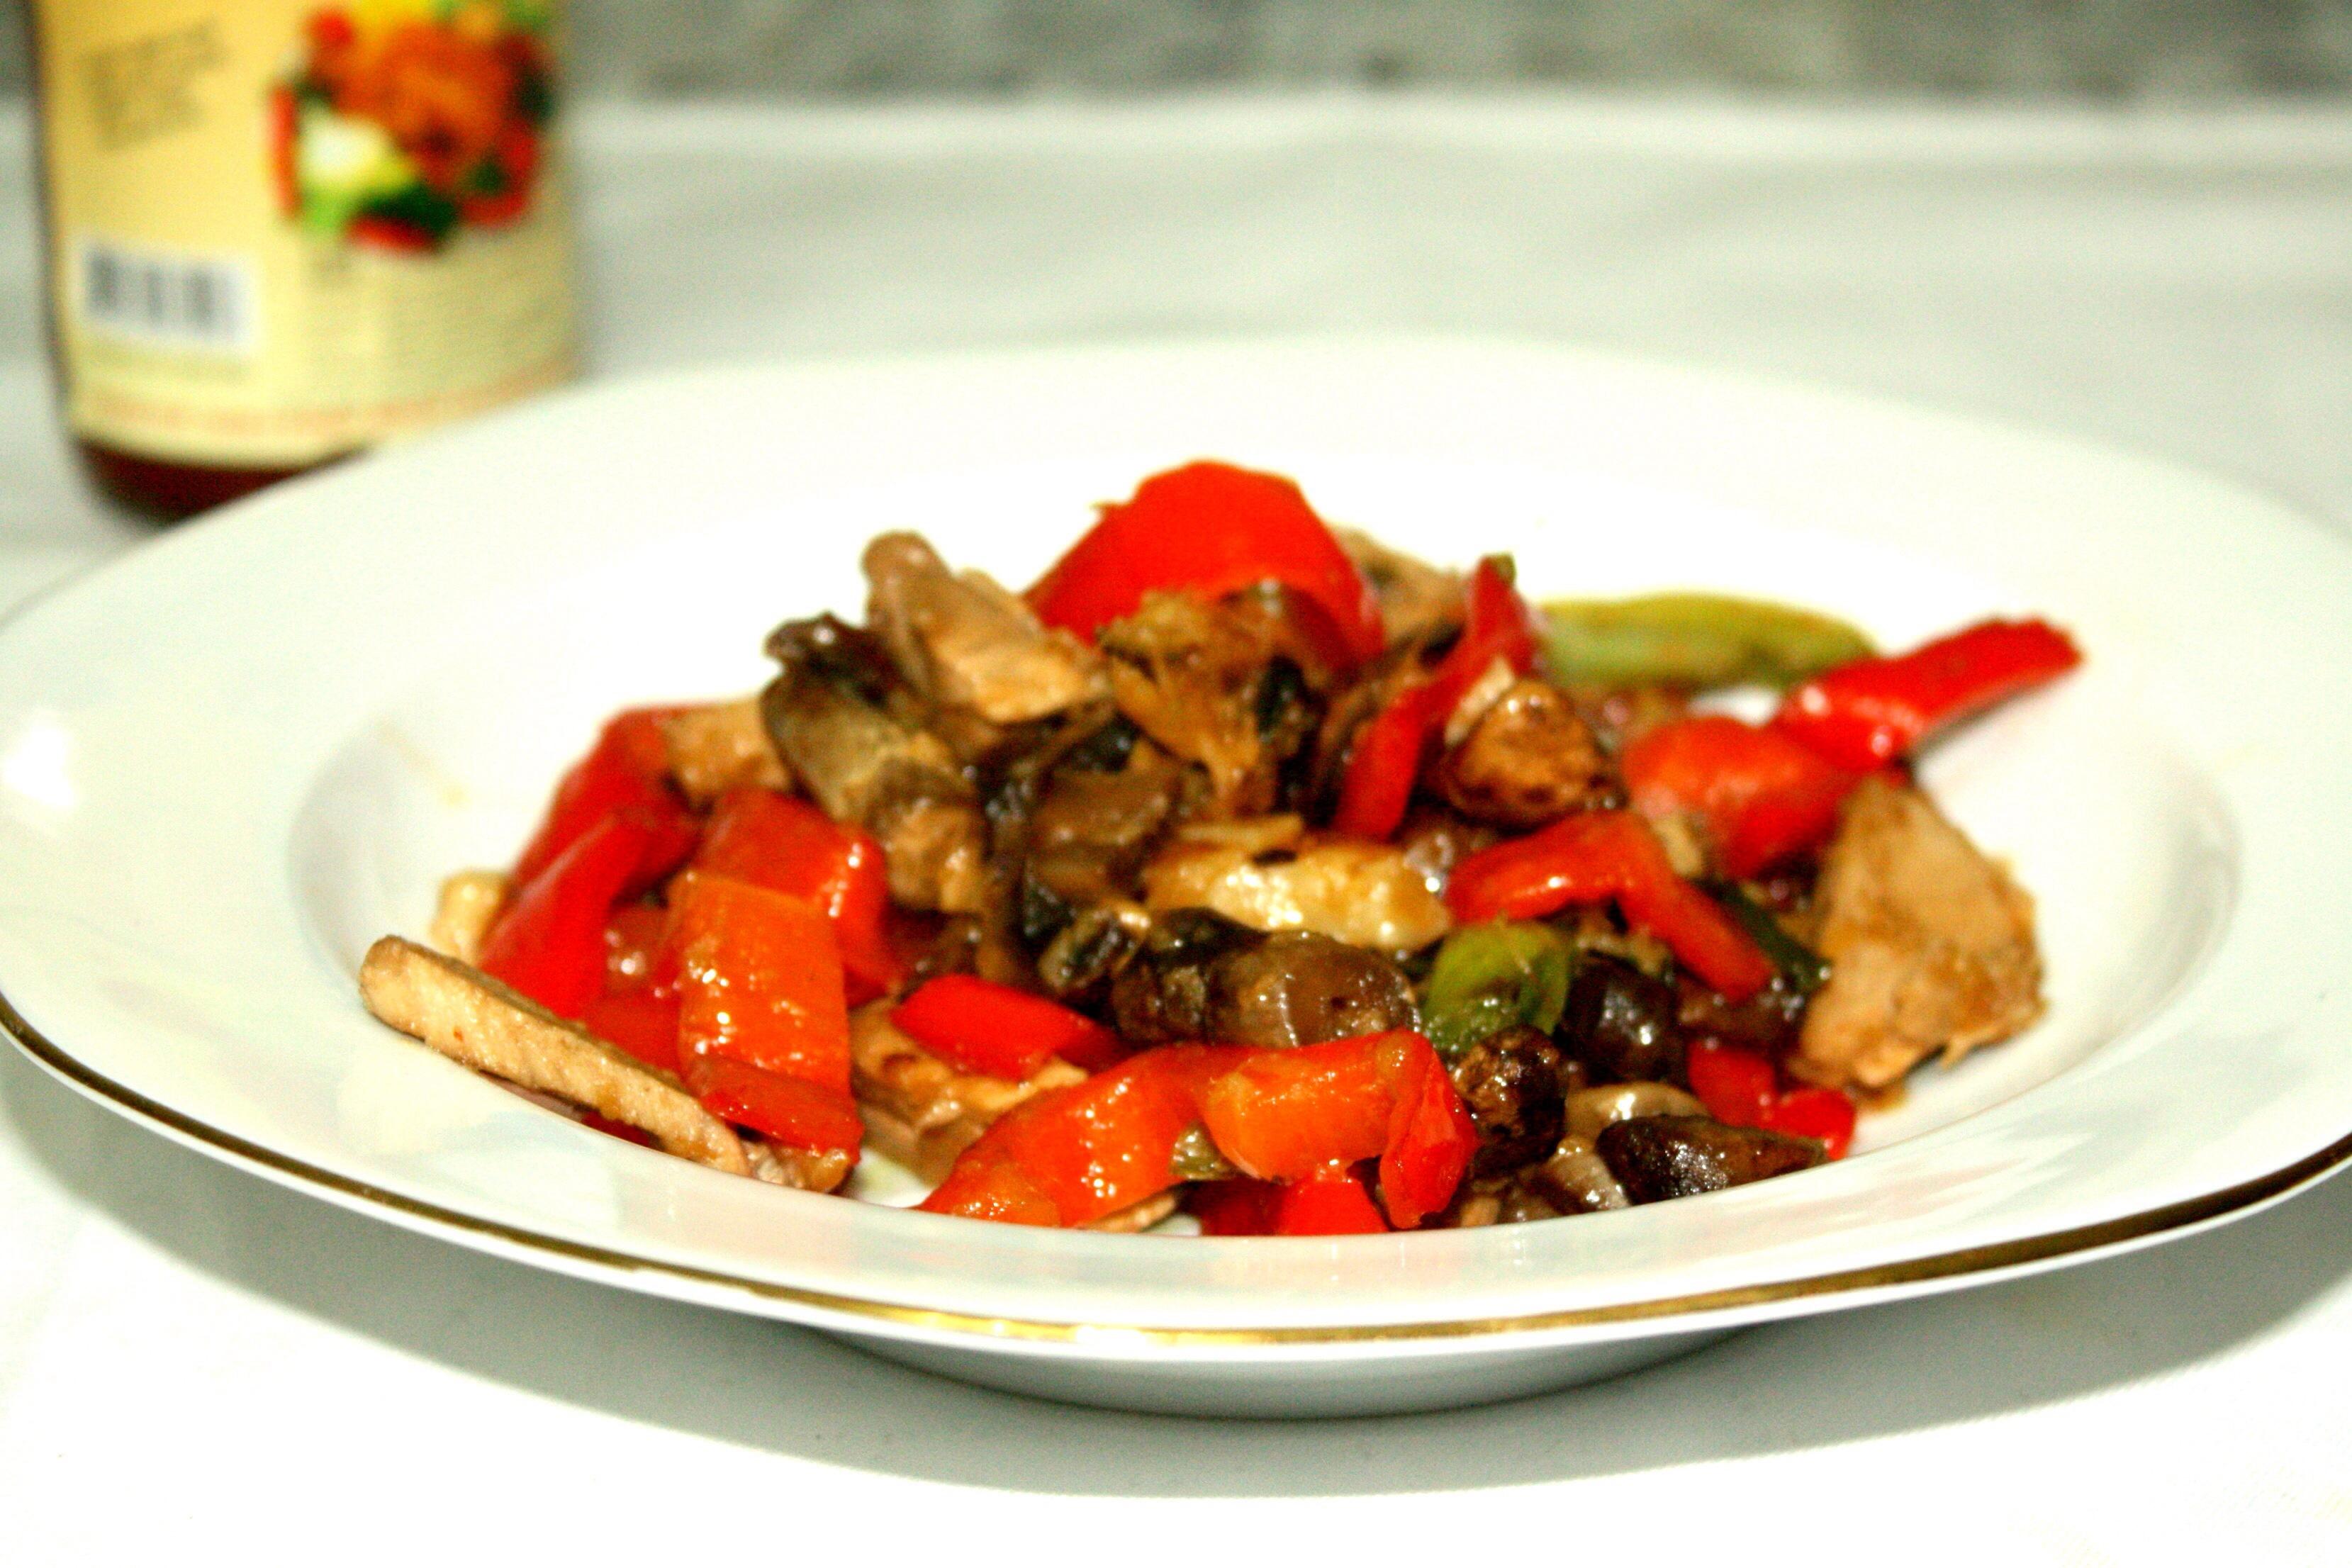 legume stir-fry